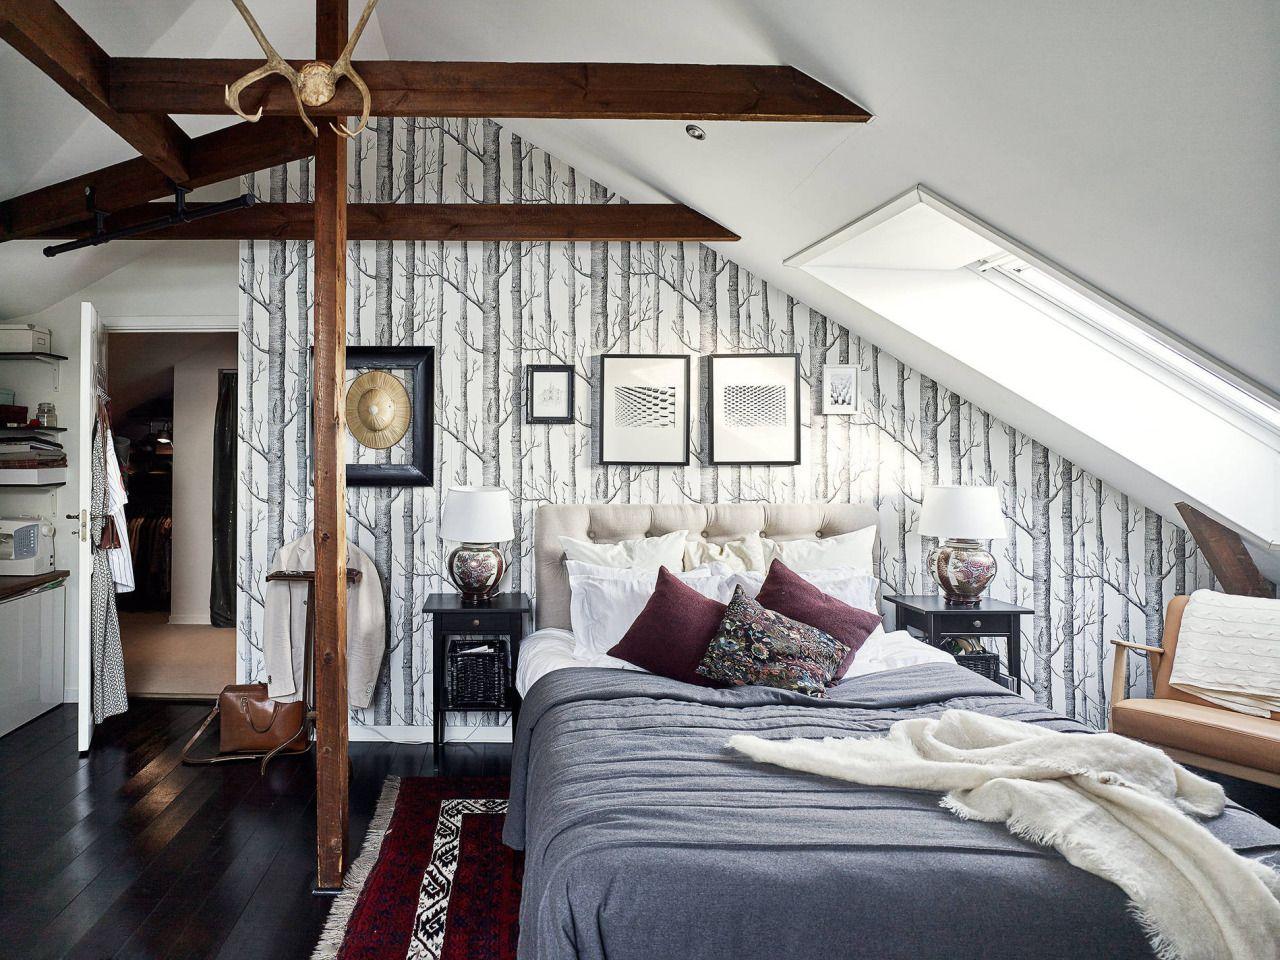 Attic bedroom. Photography by Krister Engström for Stadshem www ...